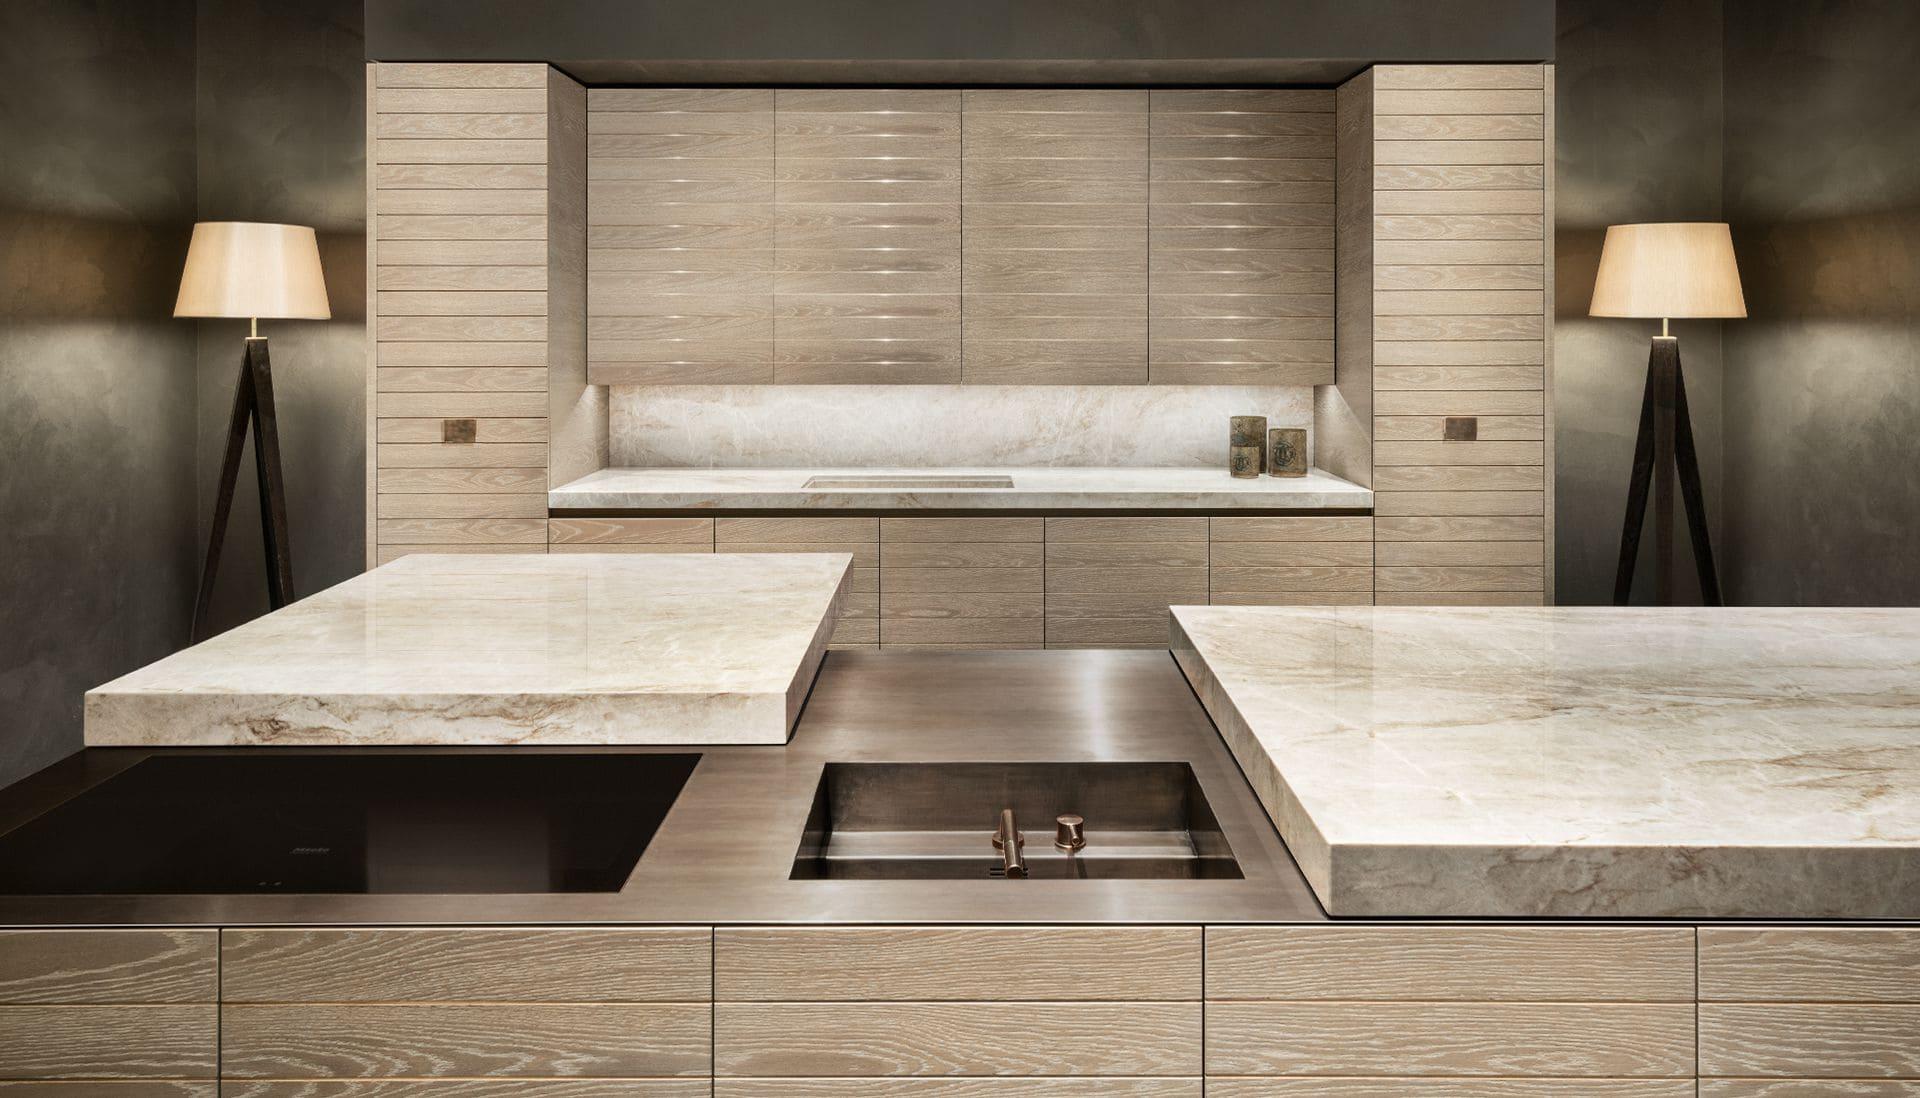 Italian Kitchen Design Contemporary Italian Kitchen Design Made In Italy